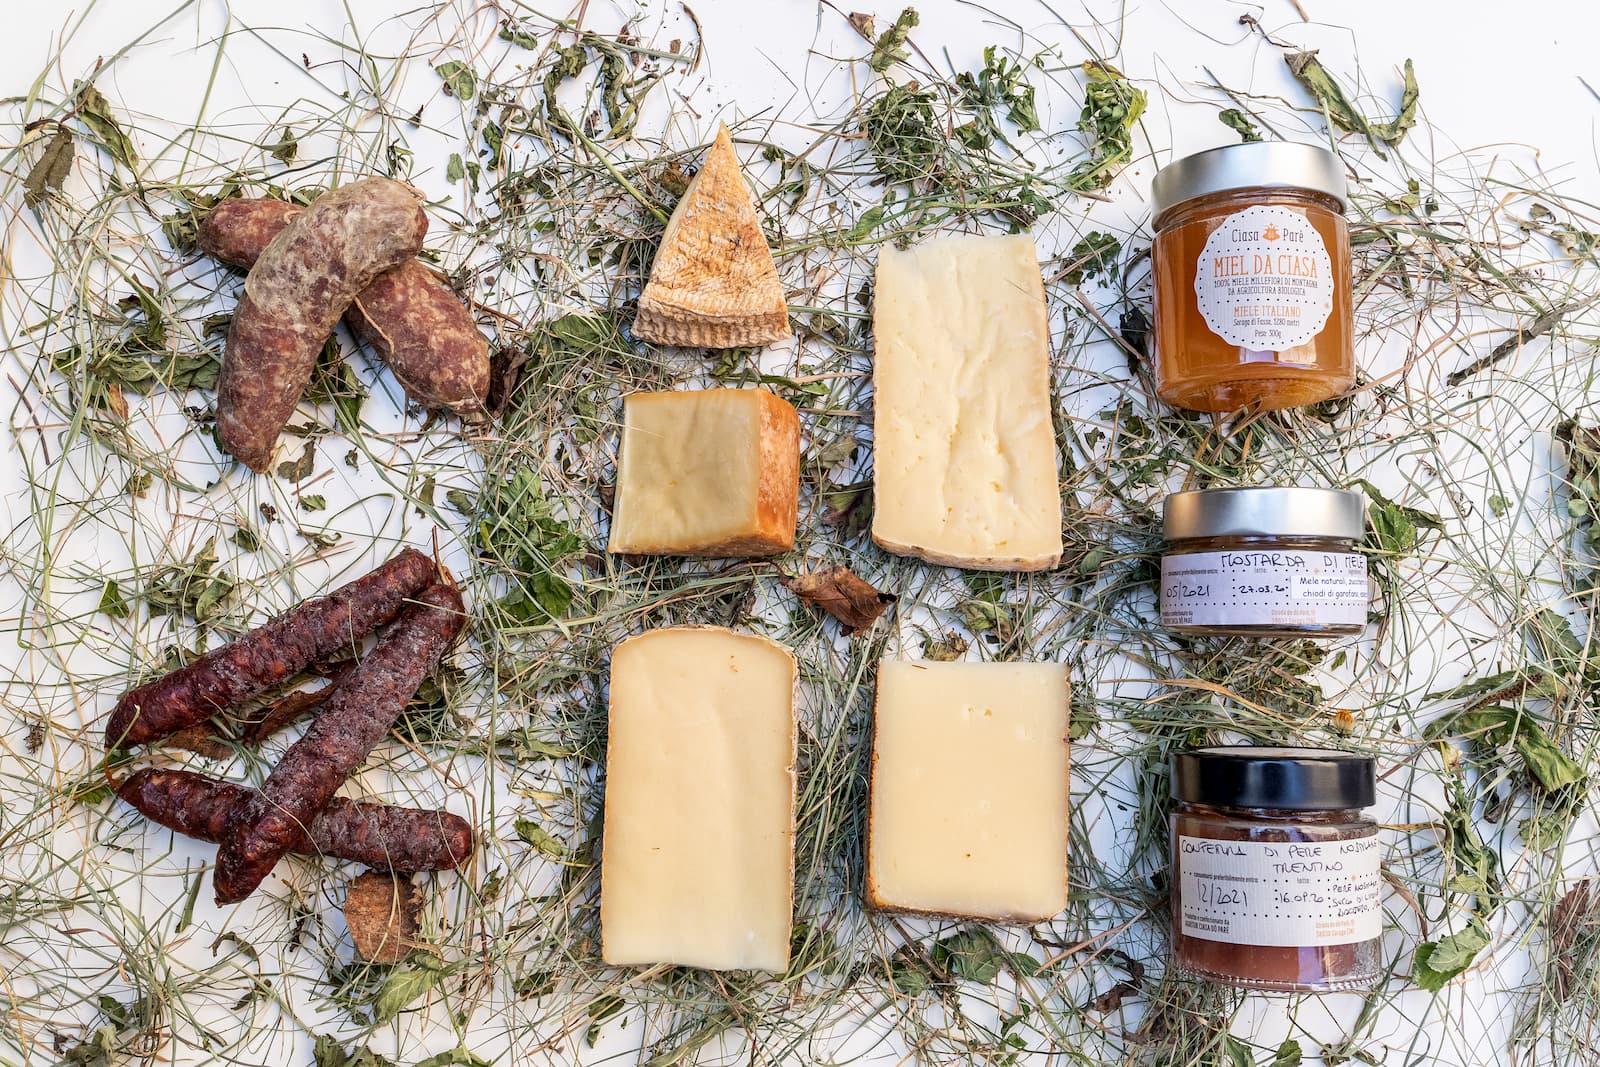 Christmas Box Gift Organic Cheese and Honey from Val di Fassa